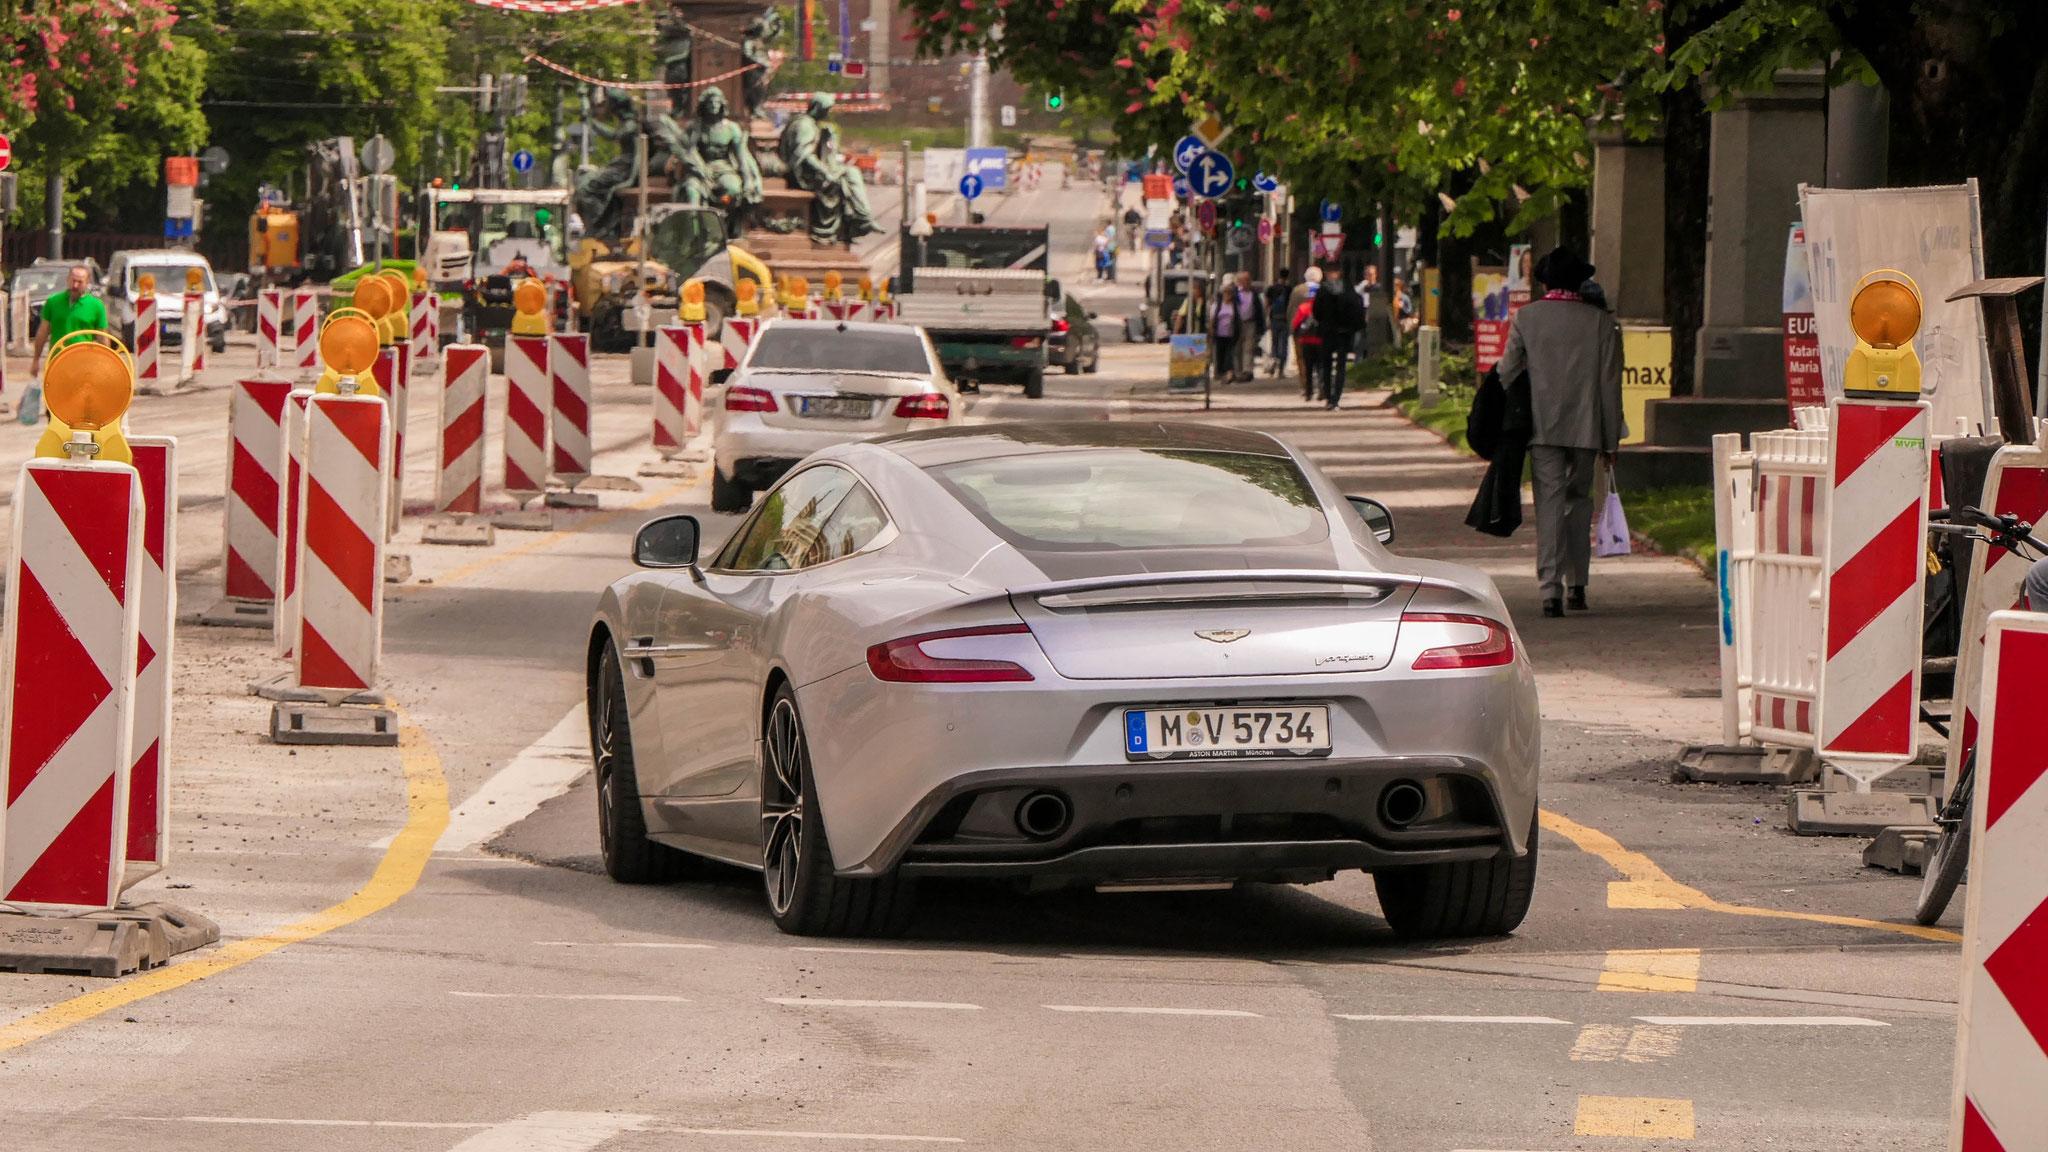 Aston Martin Vanquish - M-V-5734